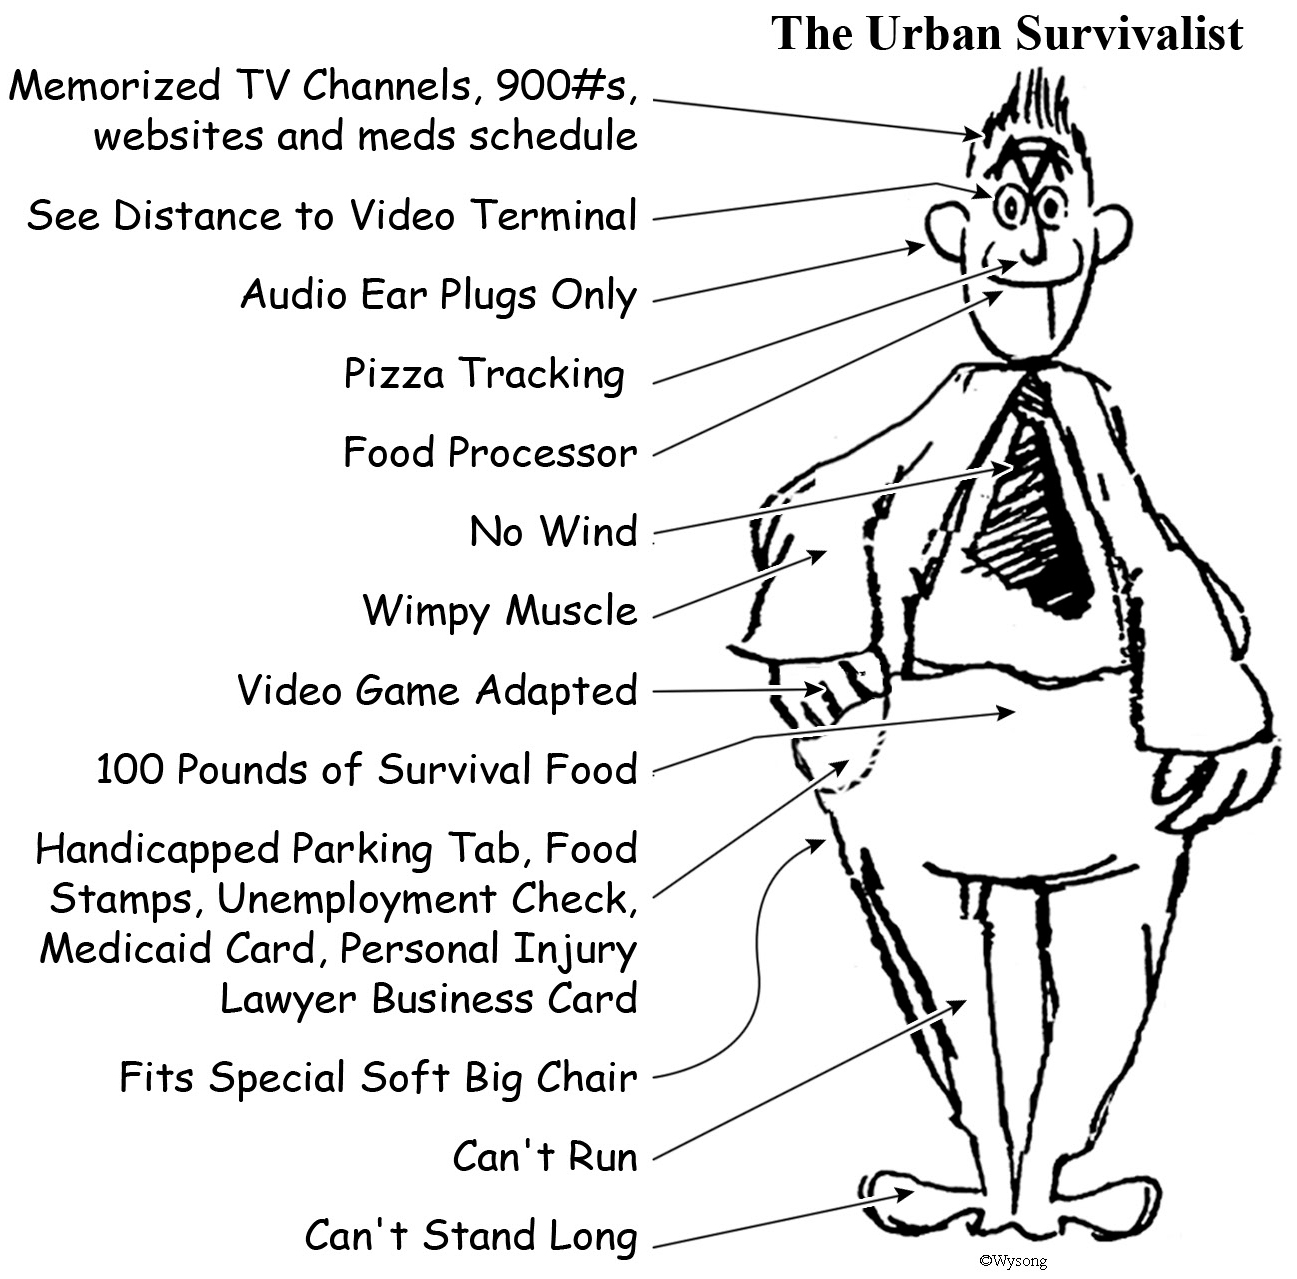 The Urban Survivalist